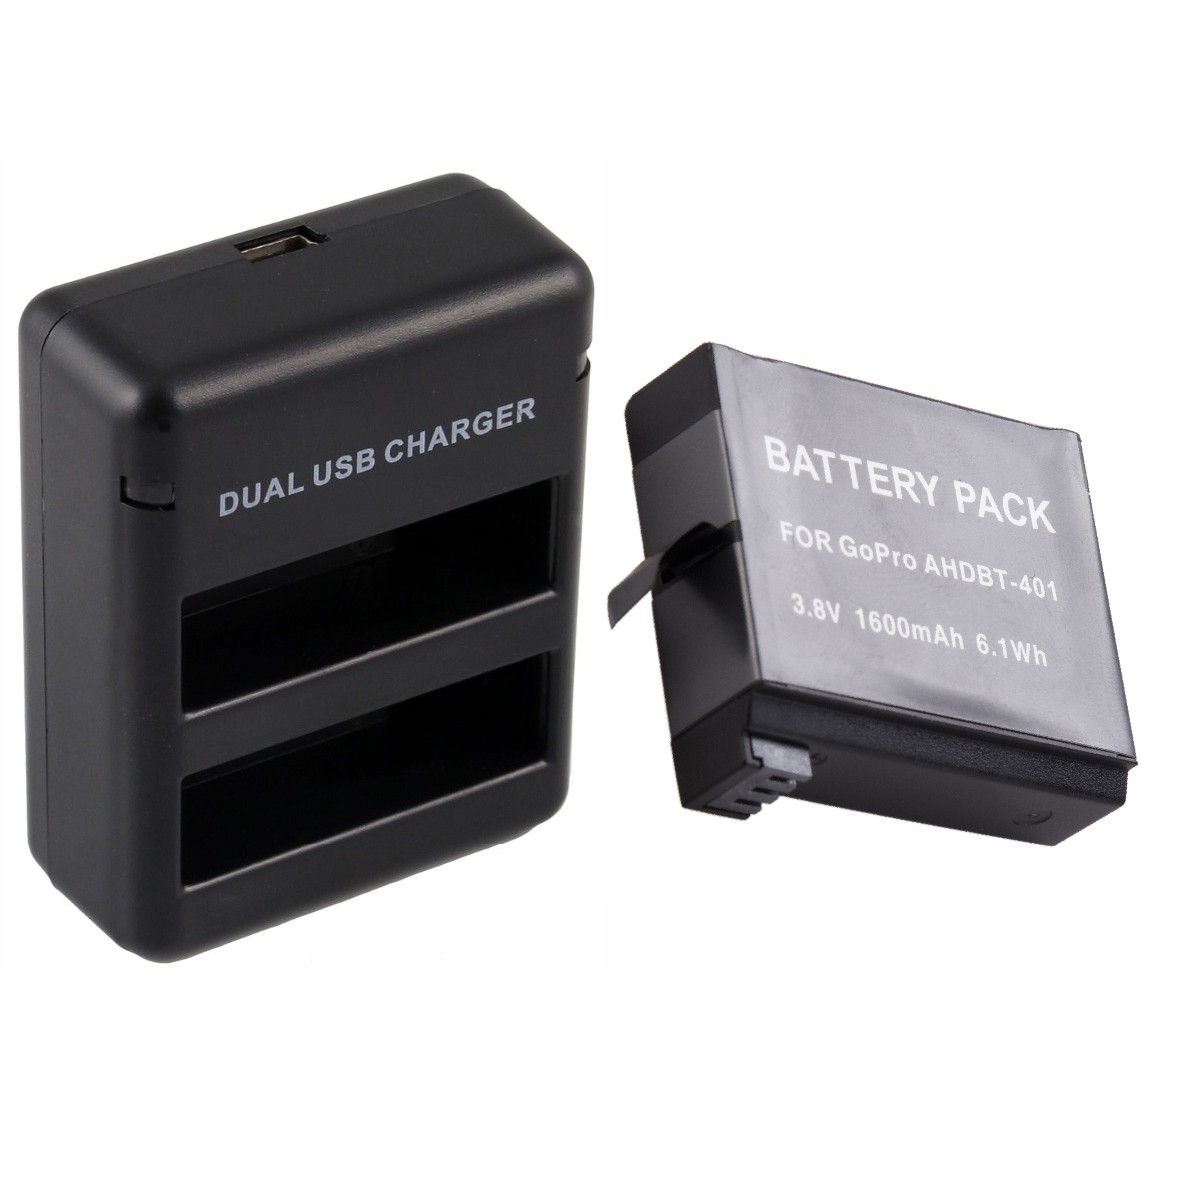 Kit 1 Bateria + Carregador Duplo Gopro Hero 4 Go Pro Ahdbt-401